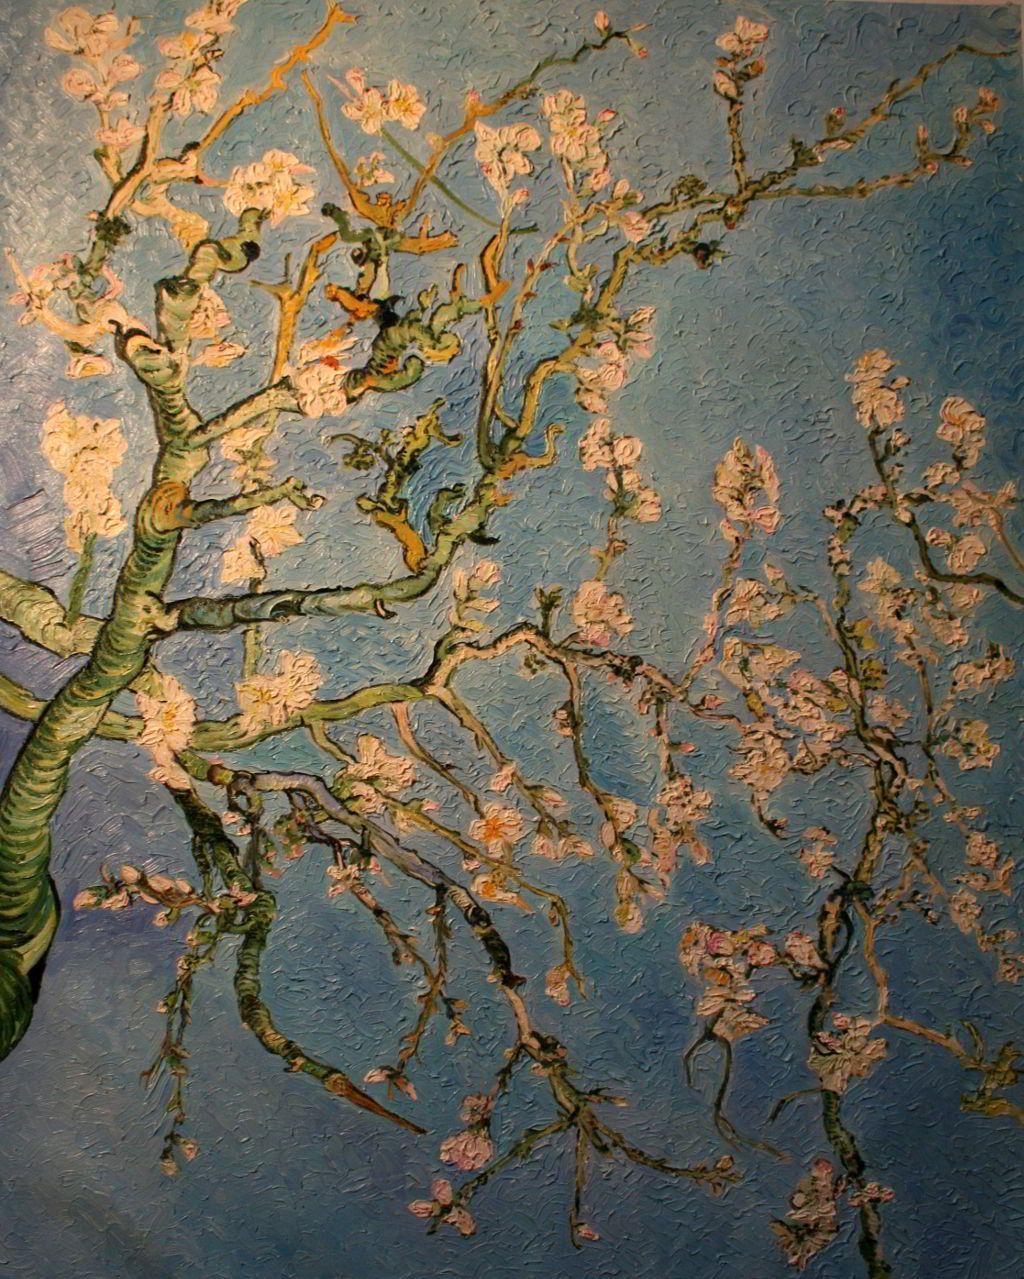 Berühmte Ölgemälde: Mandorlo in fiore oelgemaelde auf leinwand, Vincent van Gogh 1890 originalgroesse 73.3 cm x 92.4 cm original im Van Gogh Museum, Amsterdam oelgemaelde alte meister